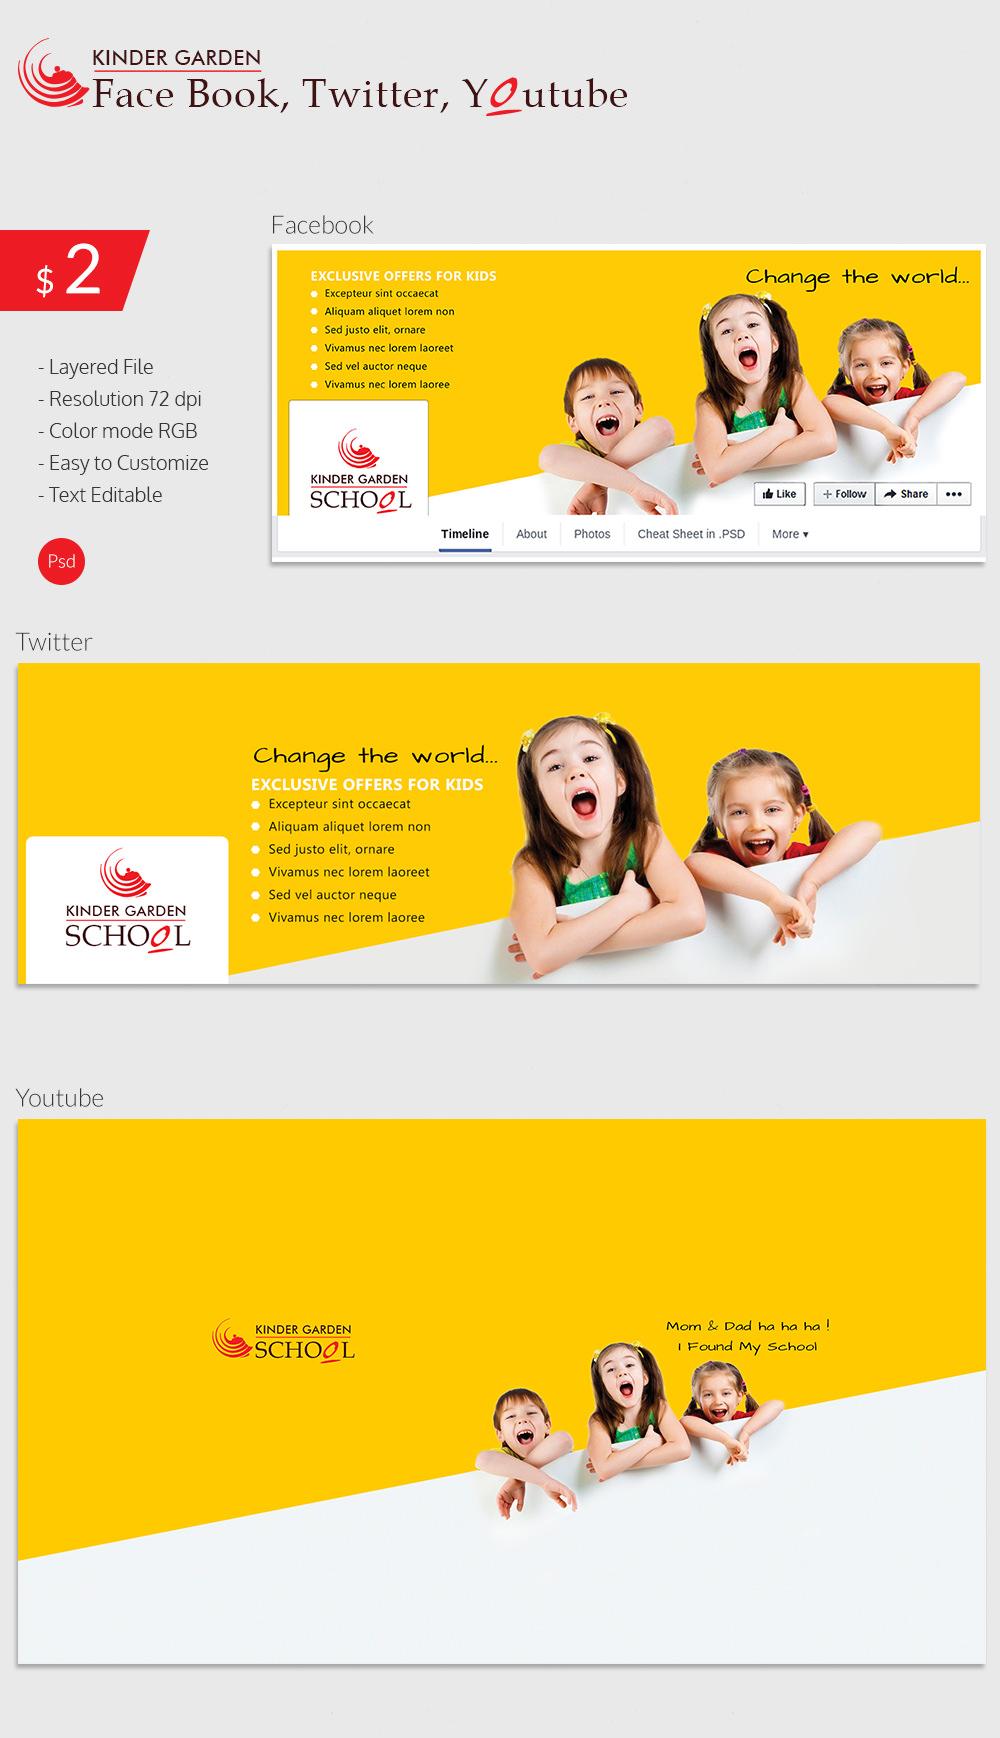 Kindergarten School Social Cover Page Design & Template